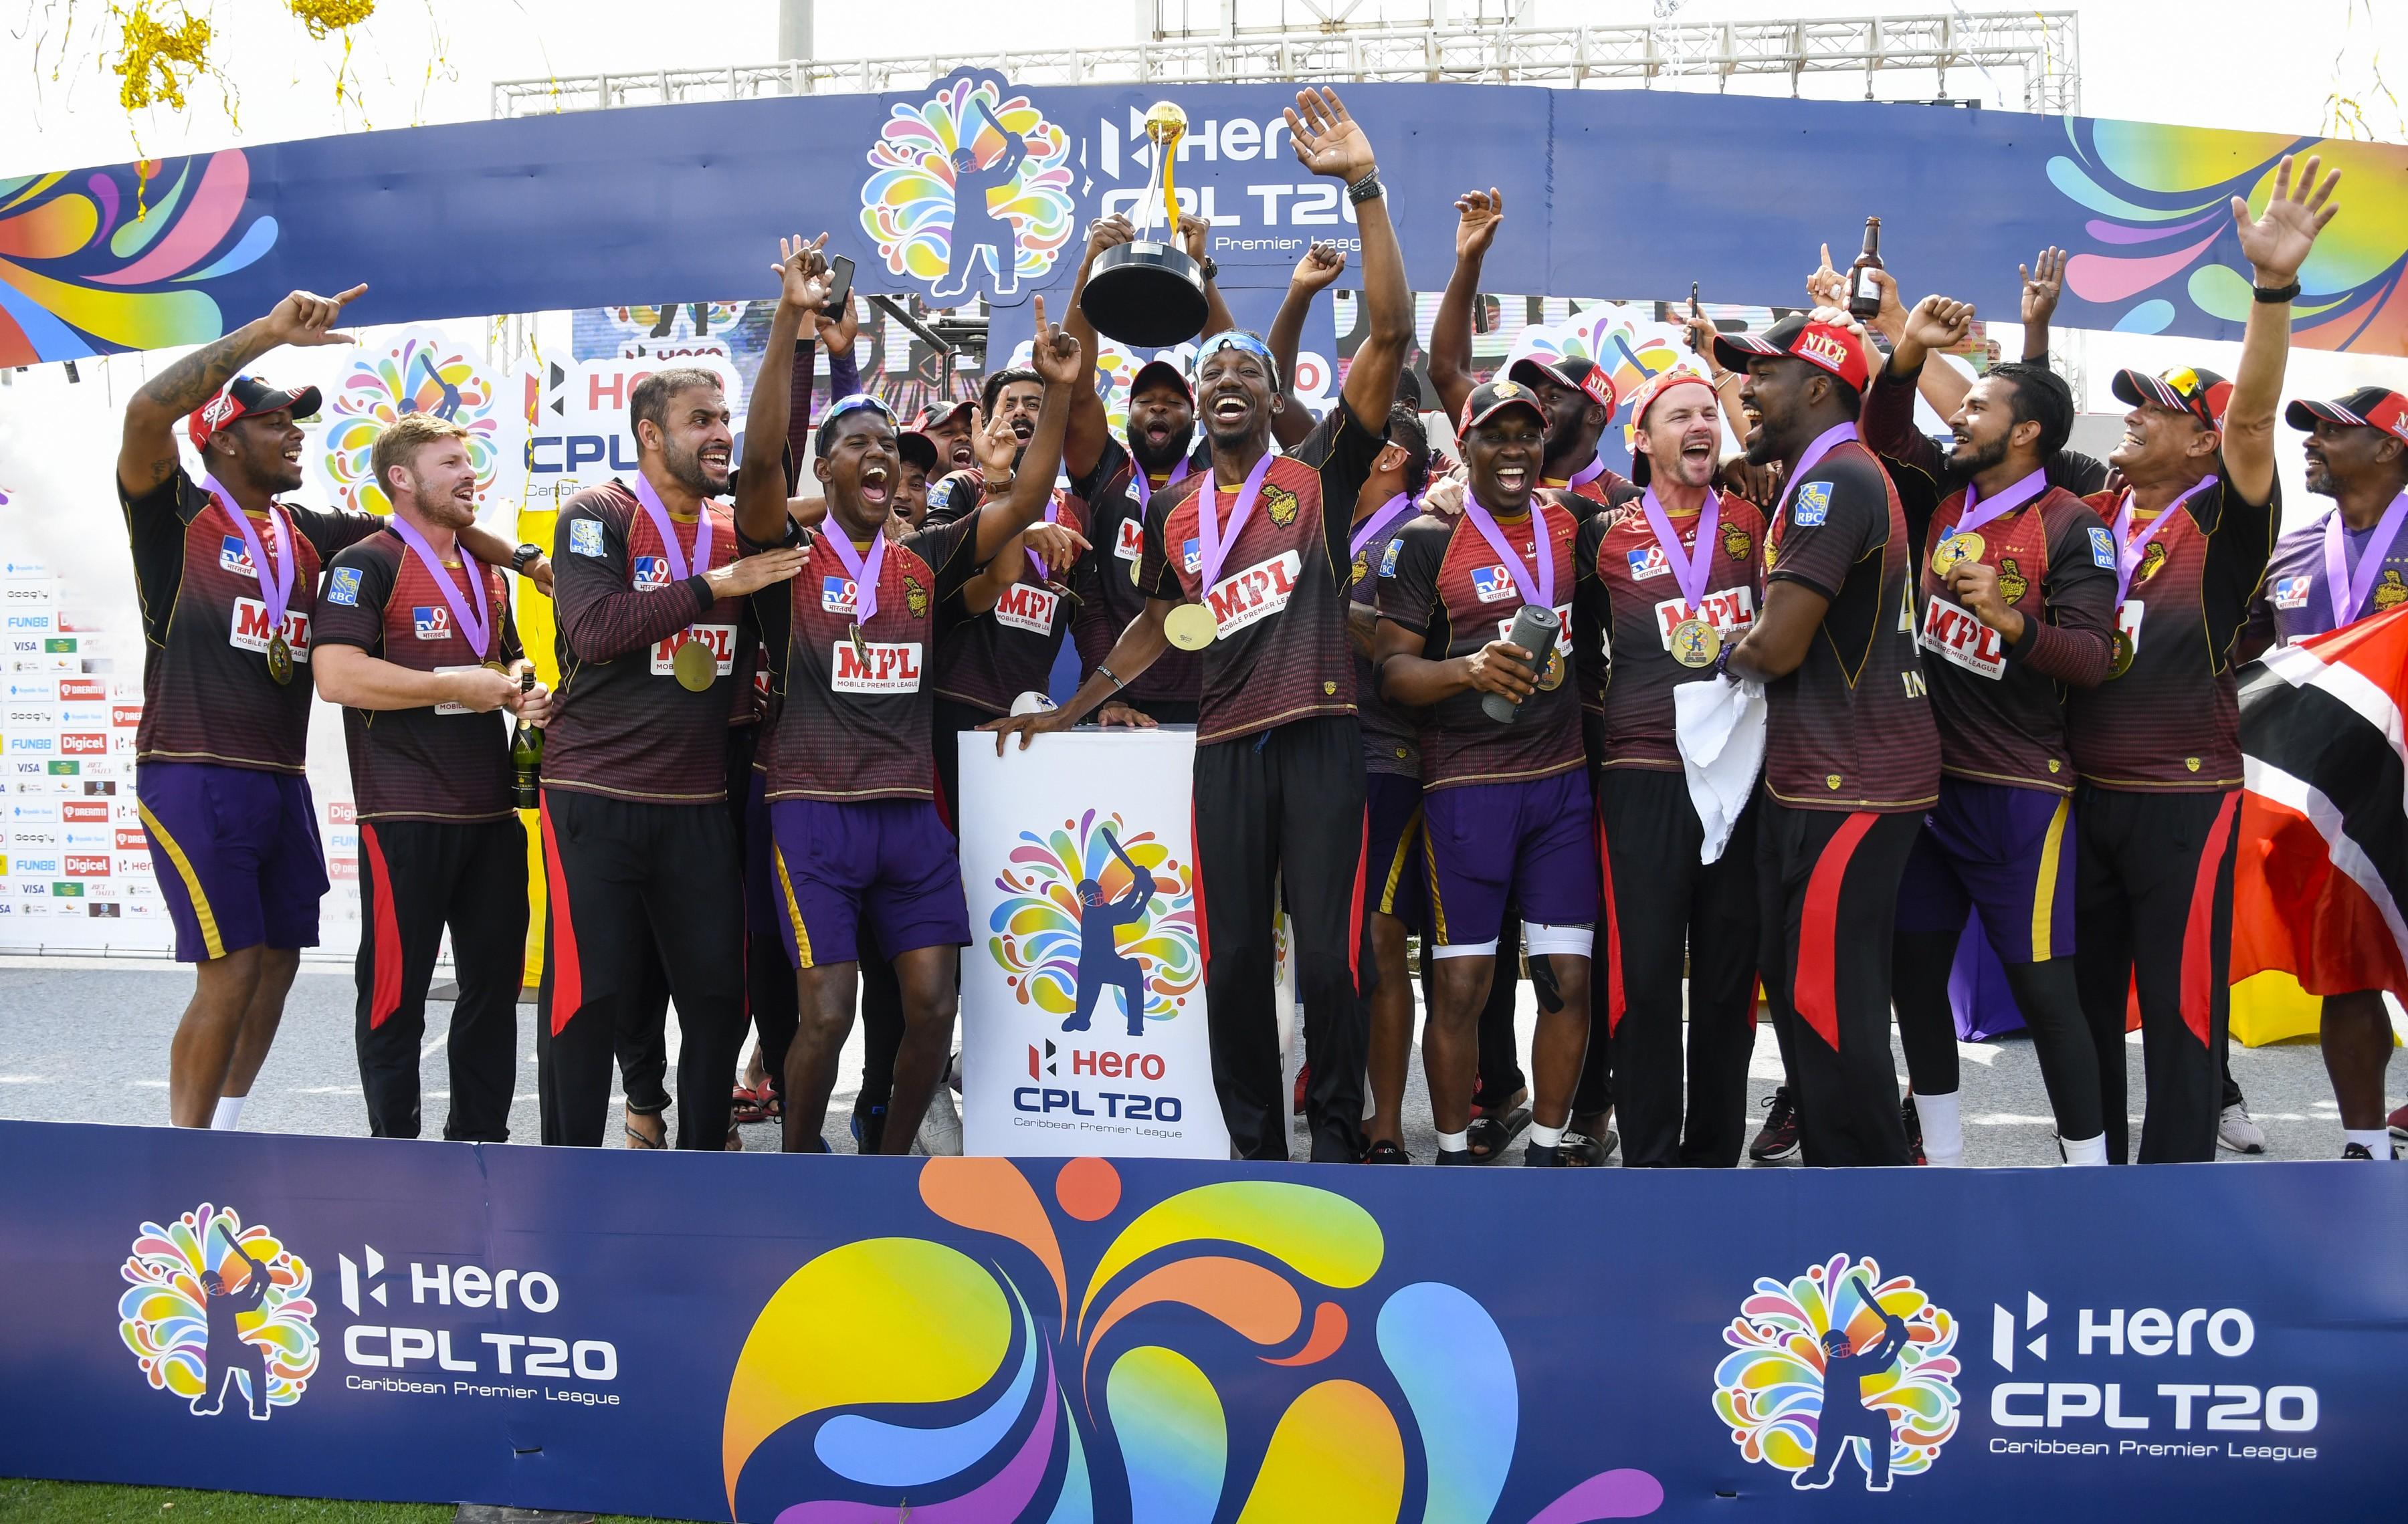 Hero Caribbean Premier League (CPL T20) | LinkedIn